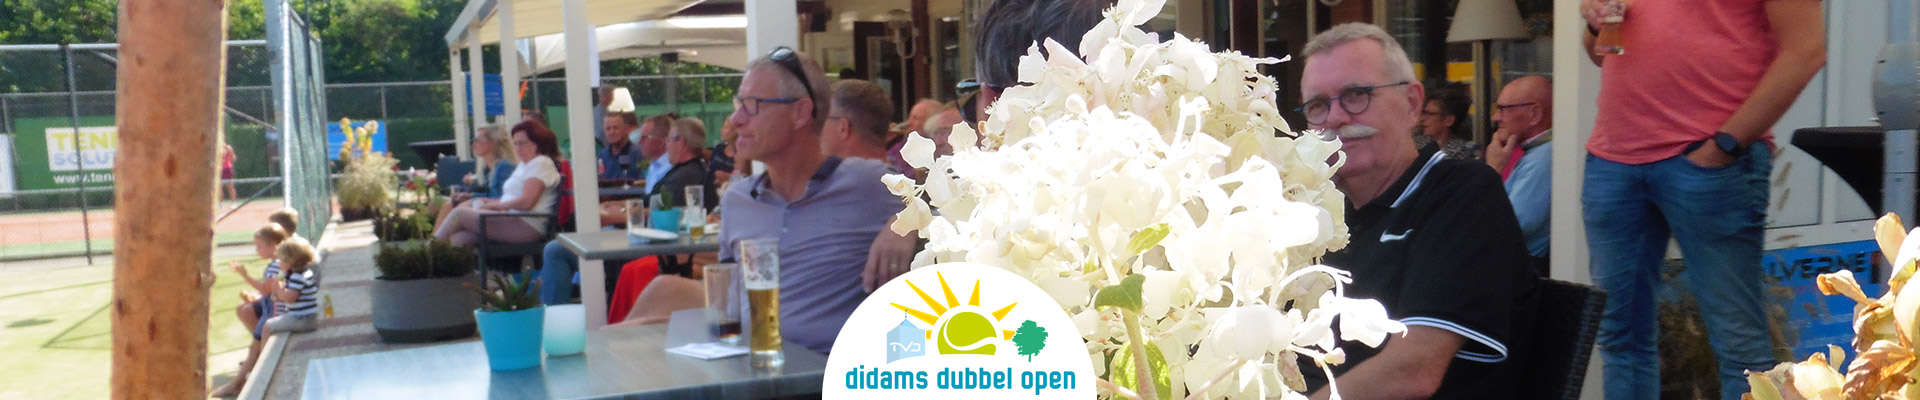 tvd_slider_didams_dubbel_open_terras